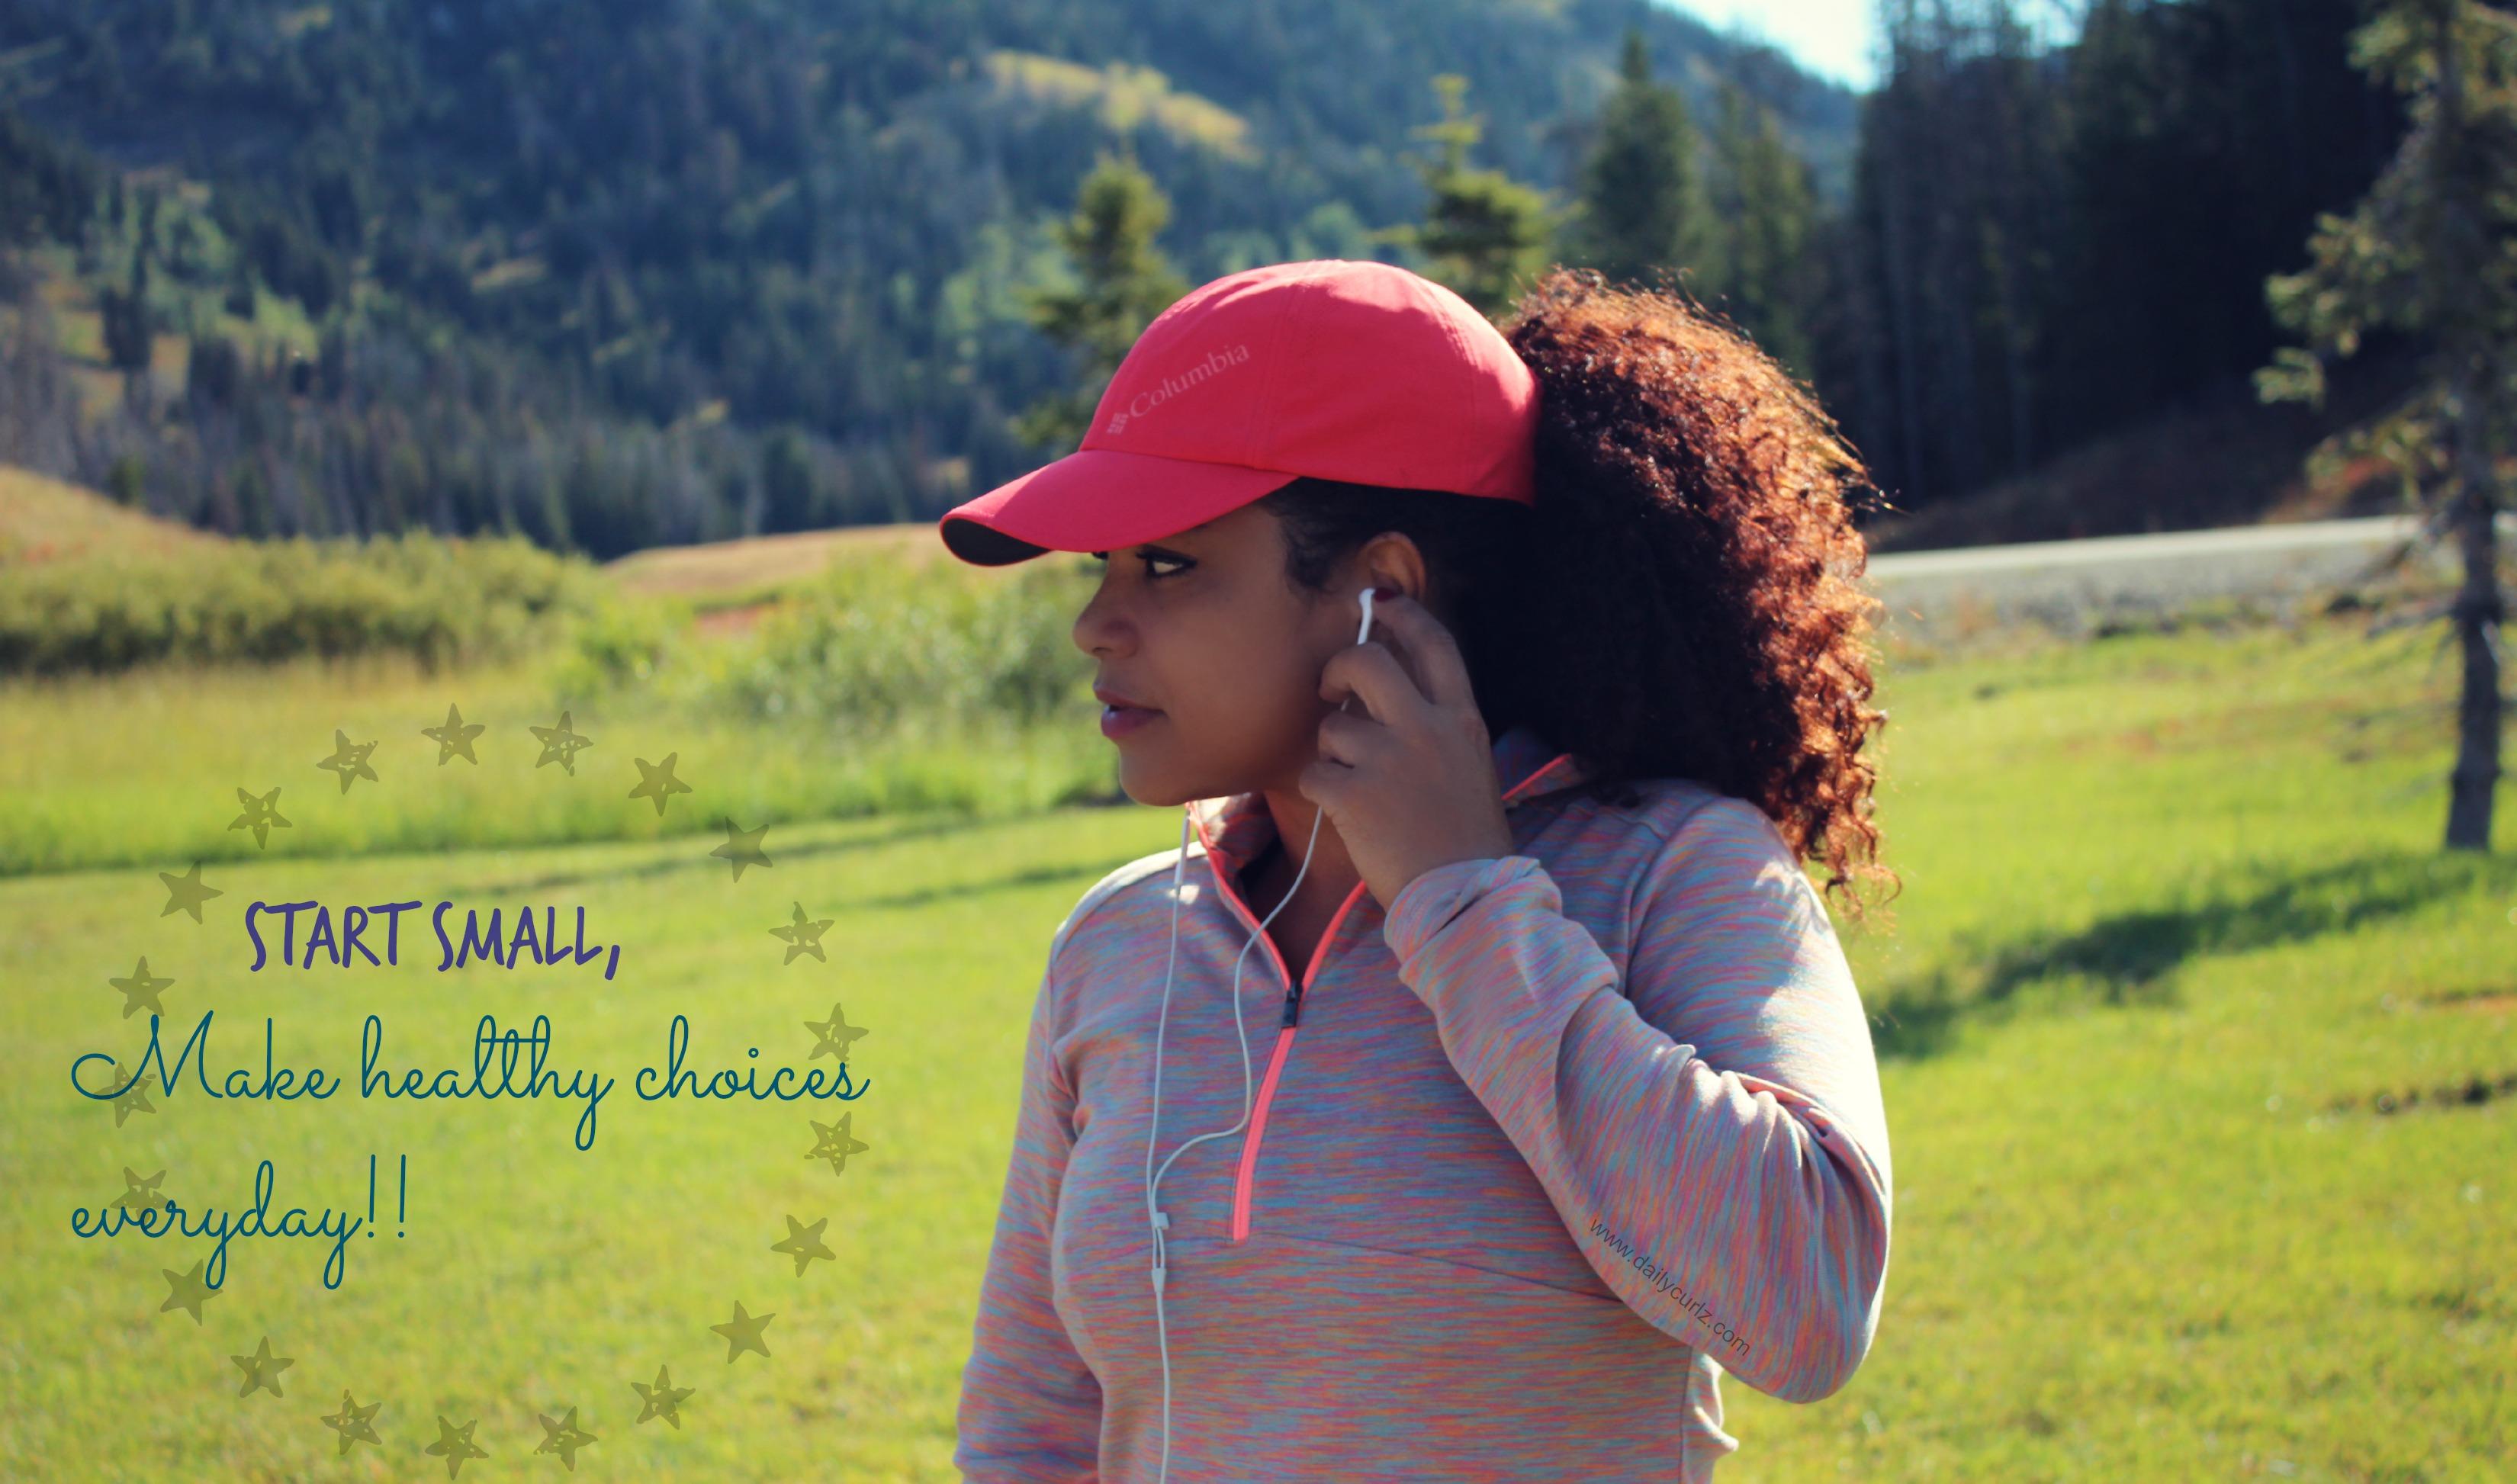 5 ways to make healthy choices on a budget/ 5 maneras de estar en forma sin gastar mucho